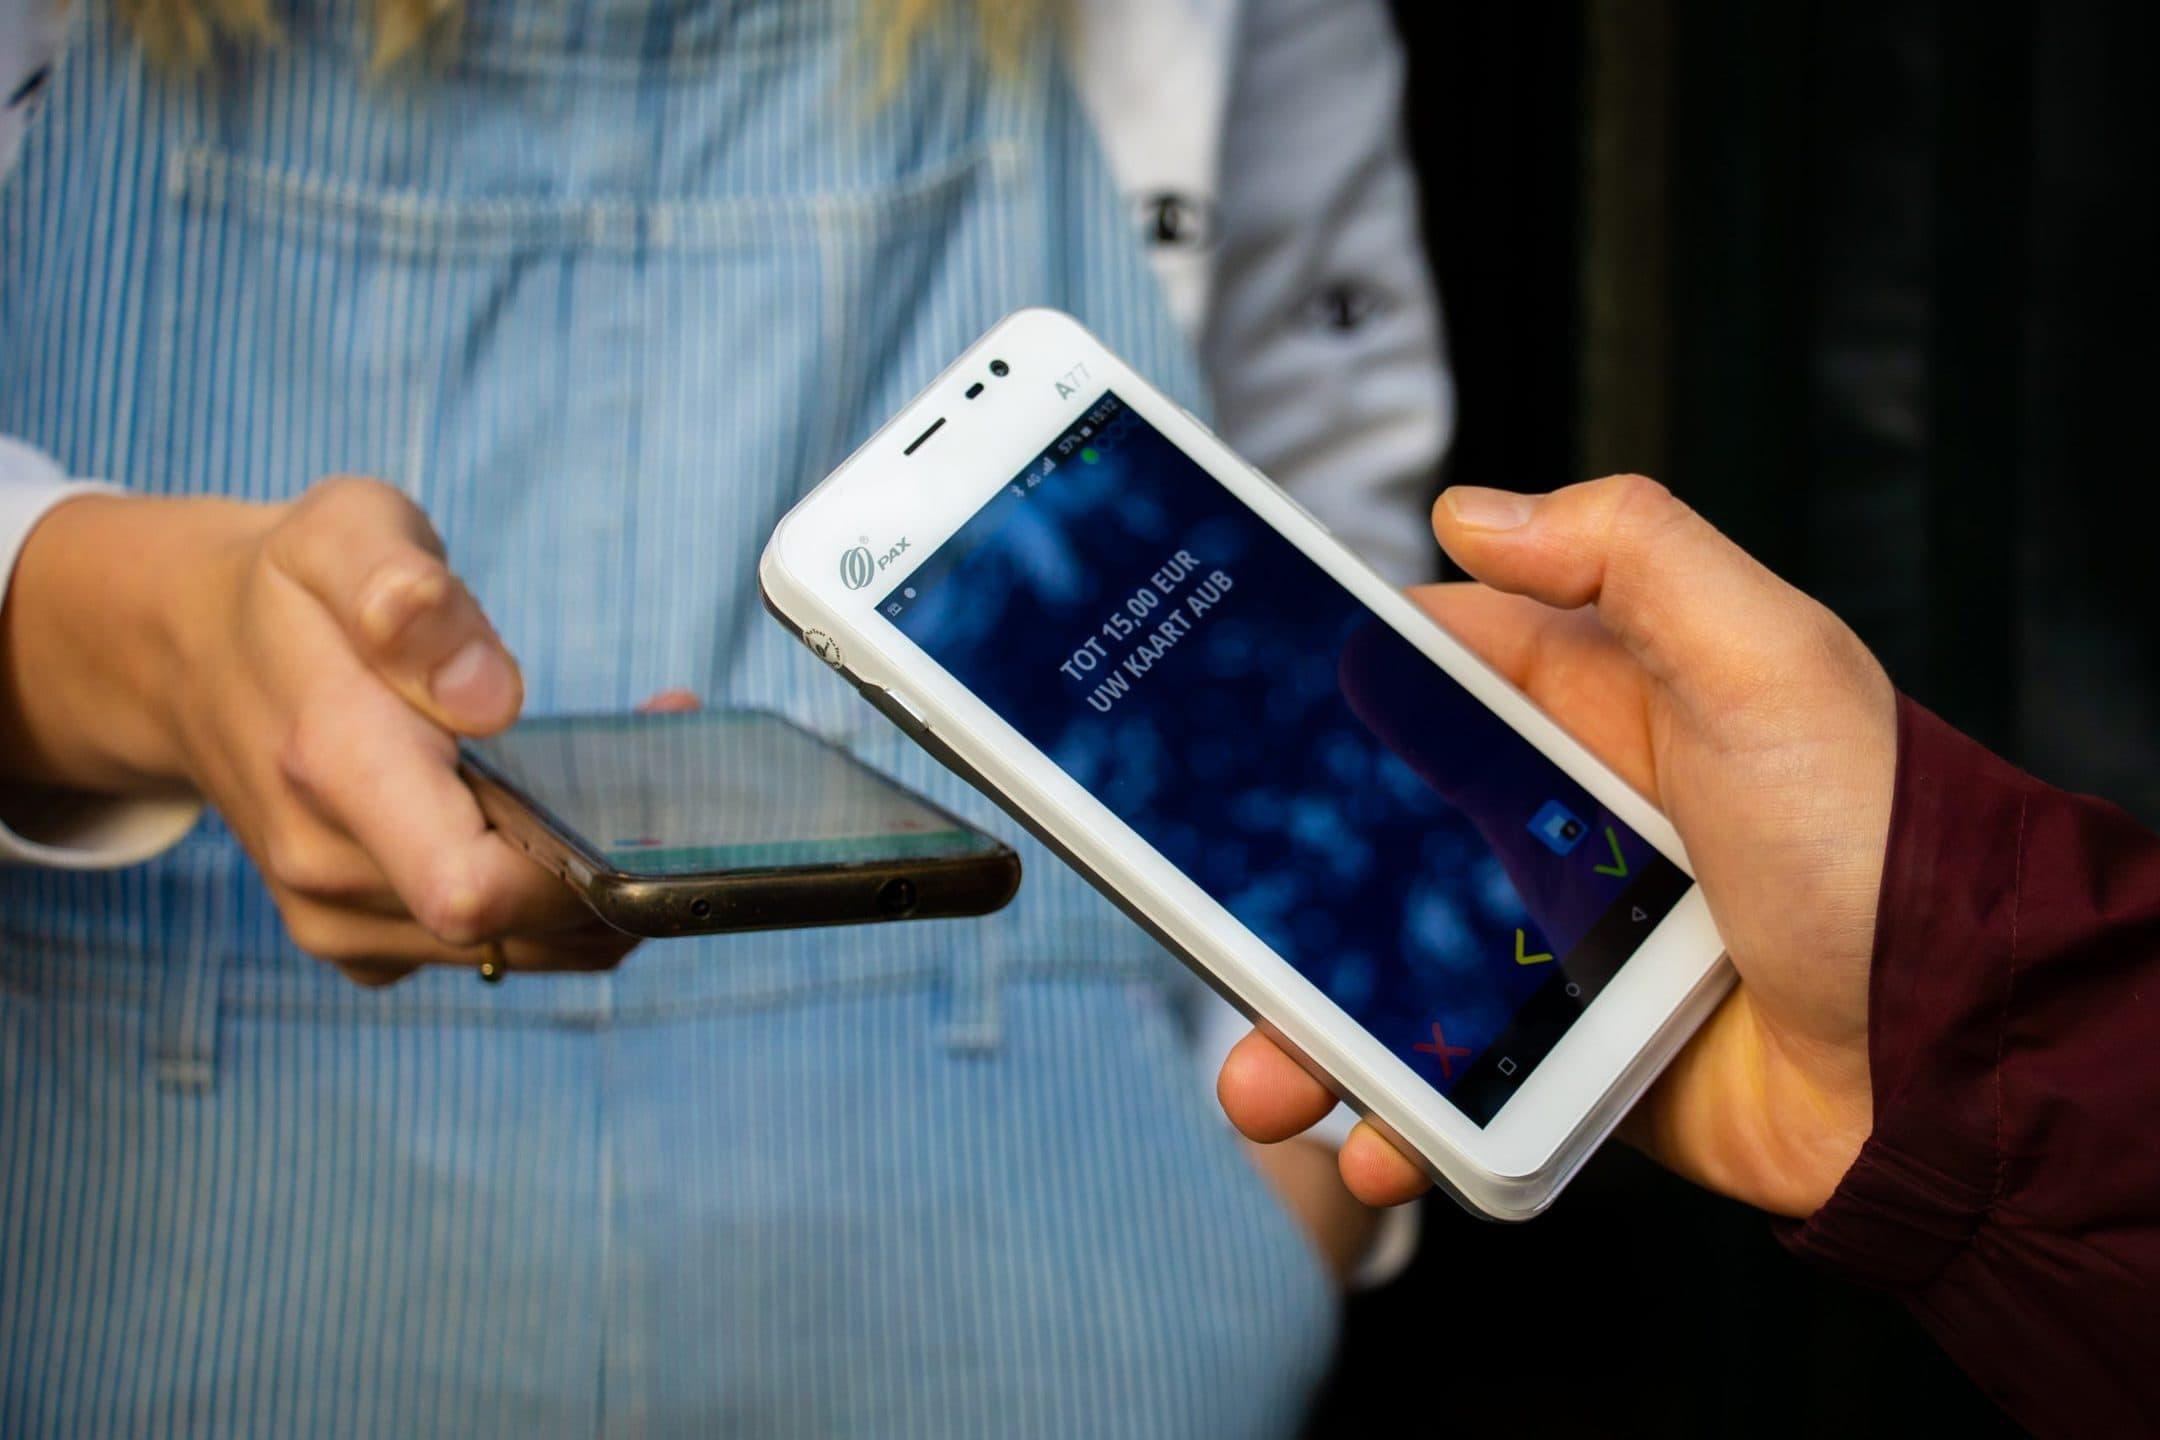 Coronacheck scanner app per direct op Pinautomaat A77